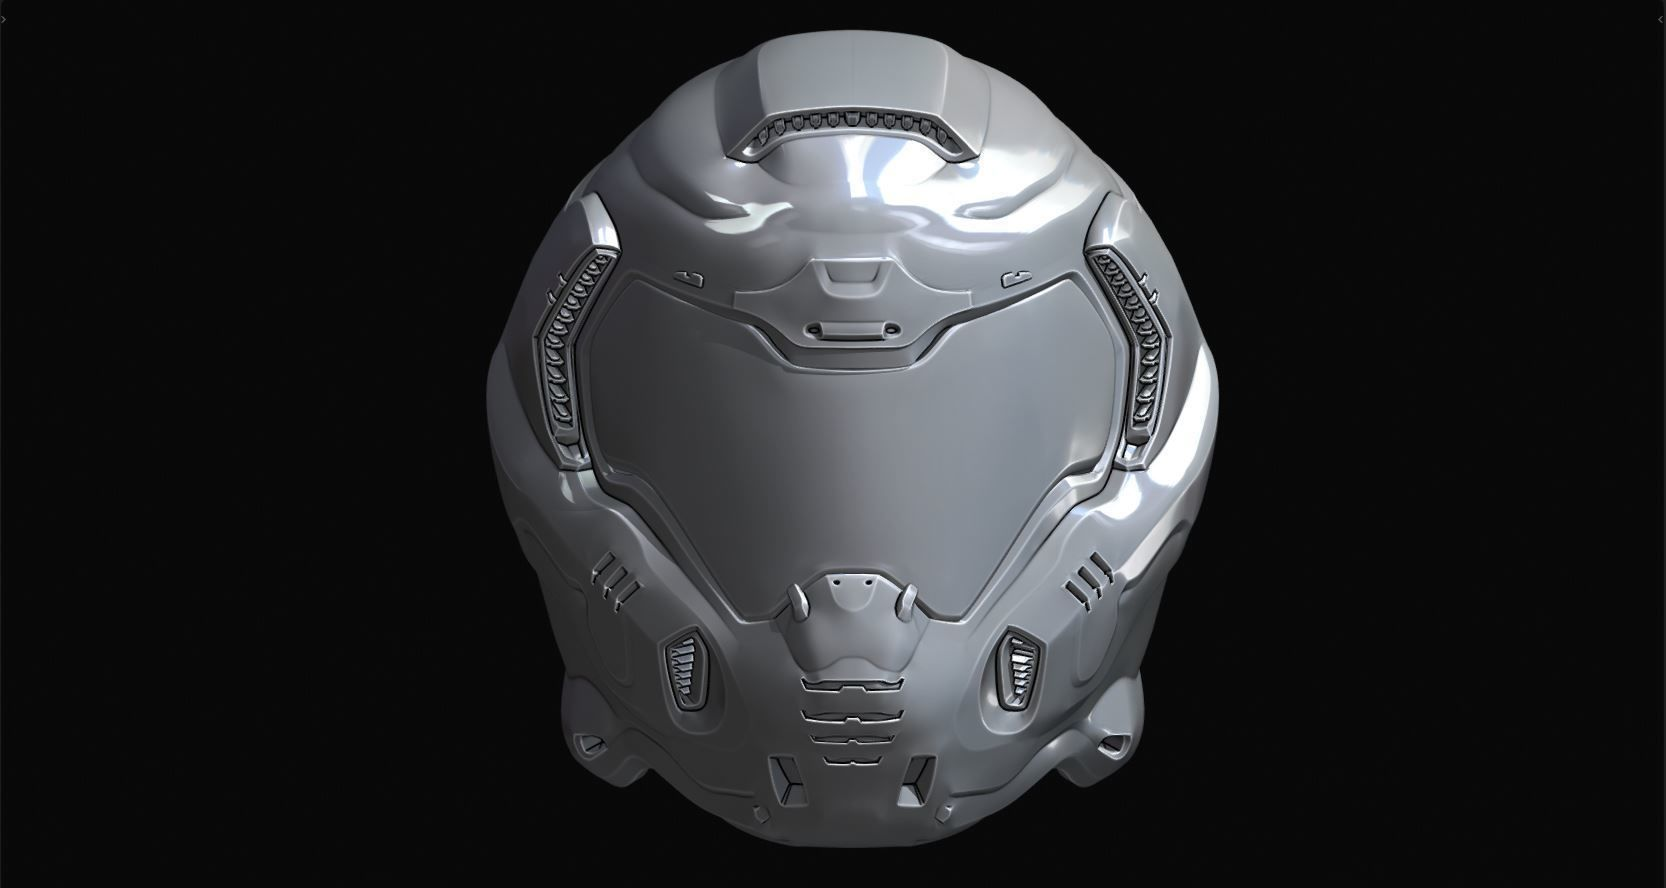 Doom Guy 2016 Helmet Detailed 3d Print Model Cgtrader